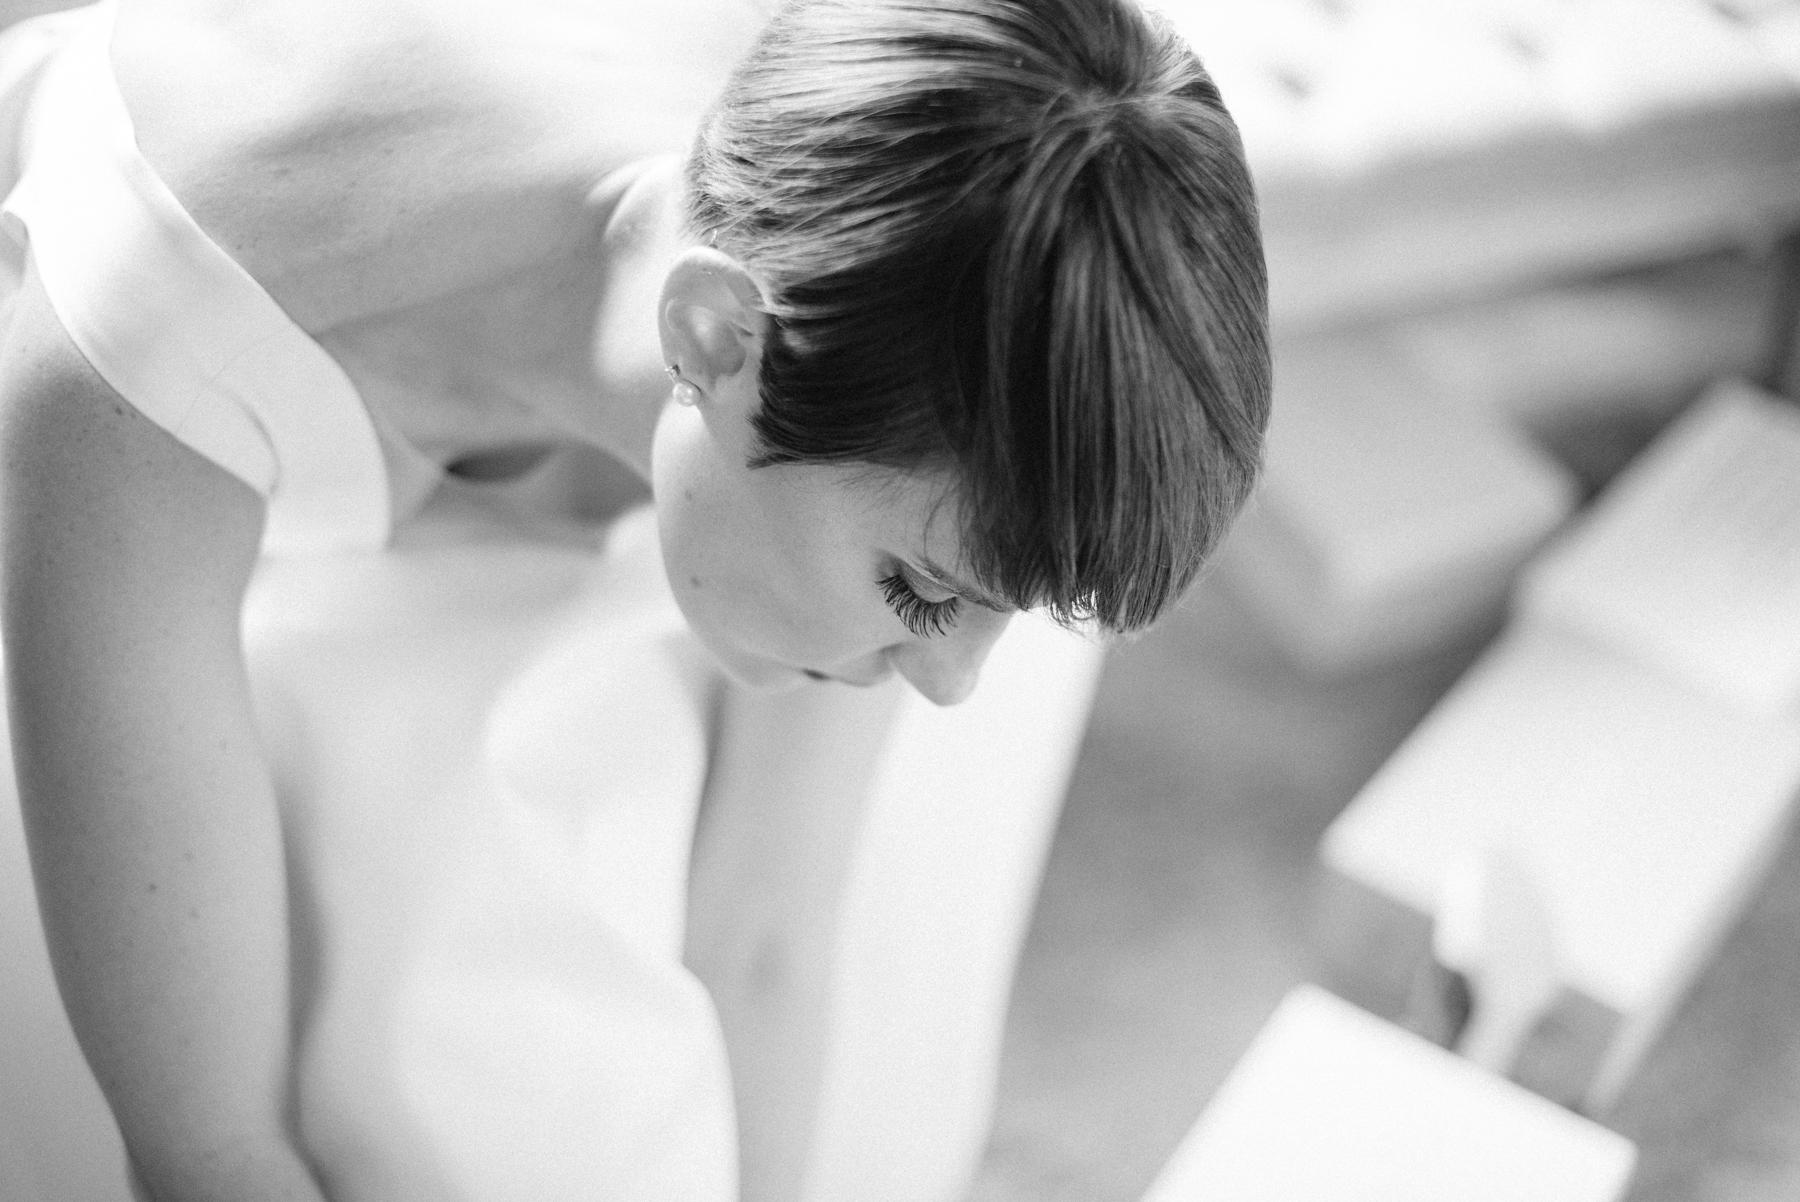 Secret Garden Event Center Wedding - Meredith Amadee Photography-1-6.jpg